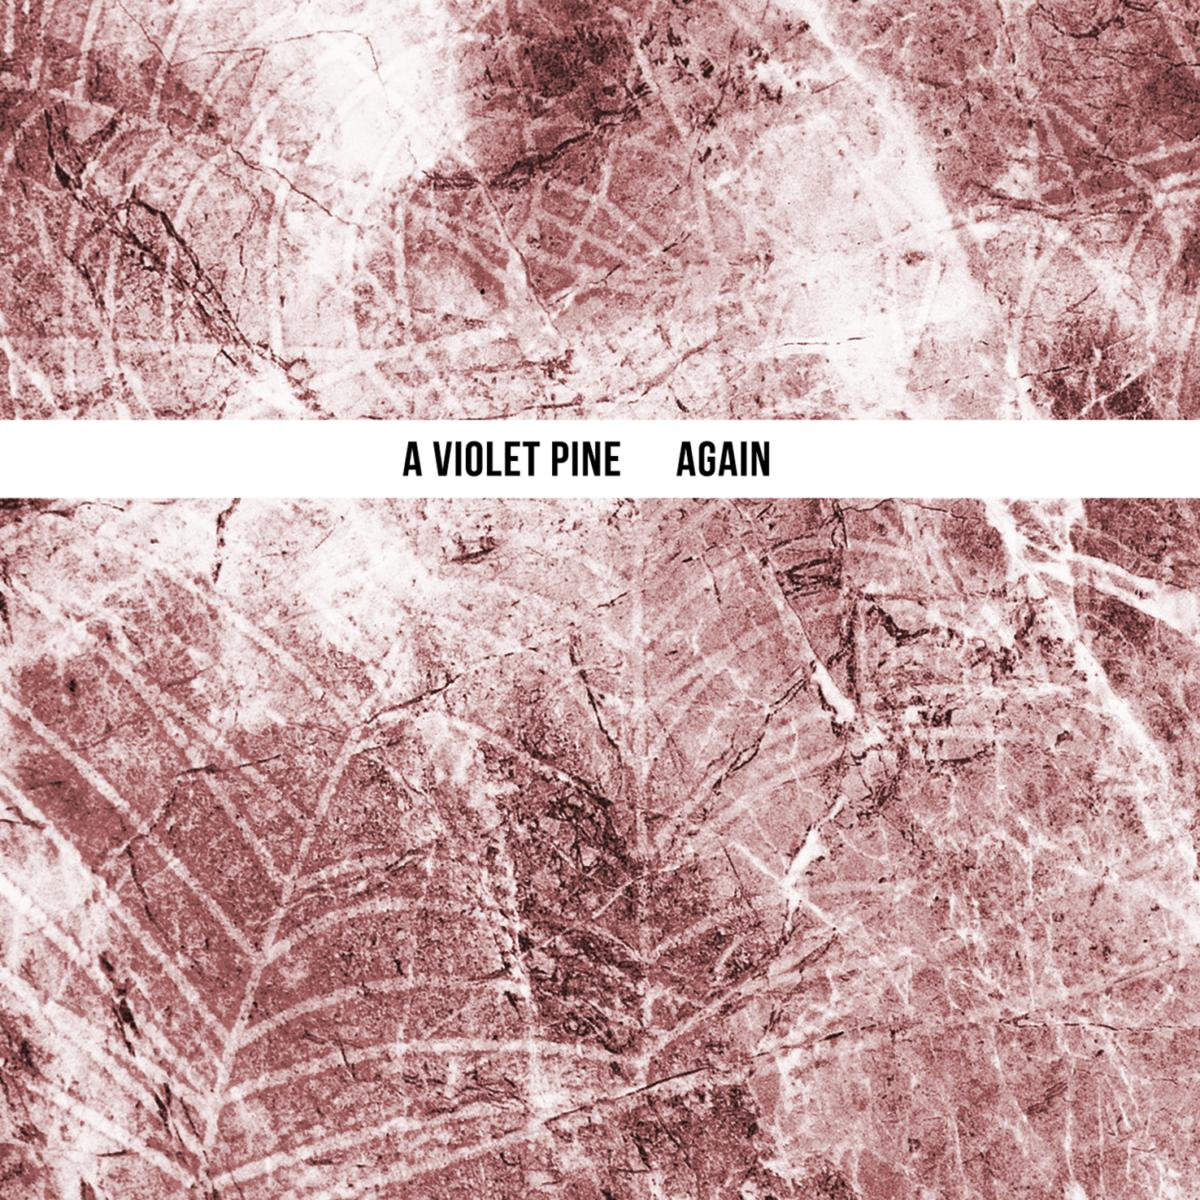 Risultati immagini per a violet pine again